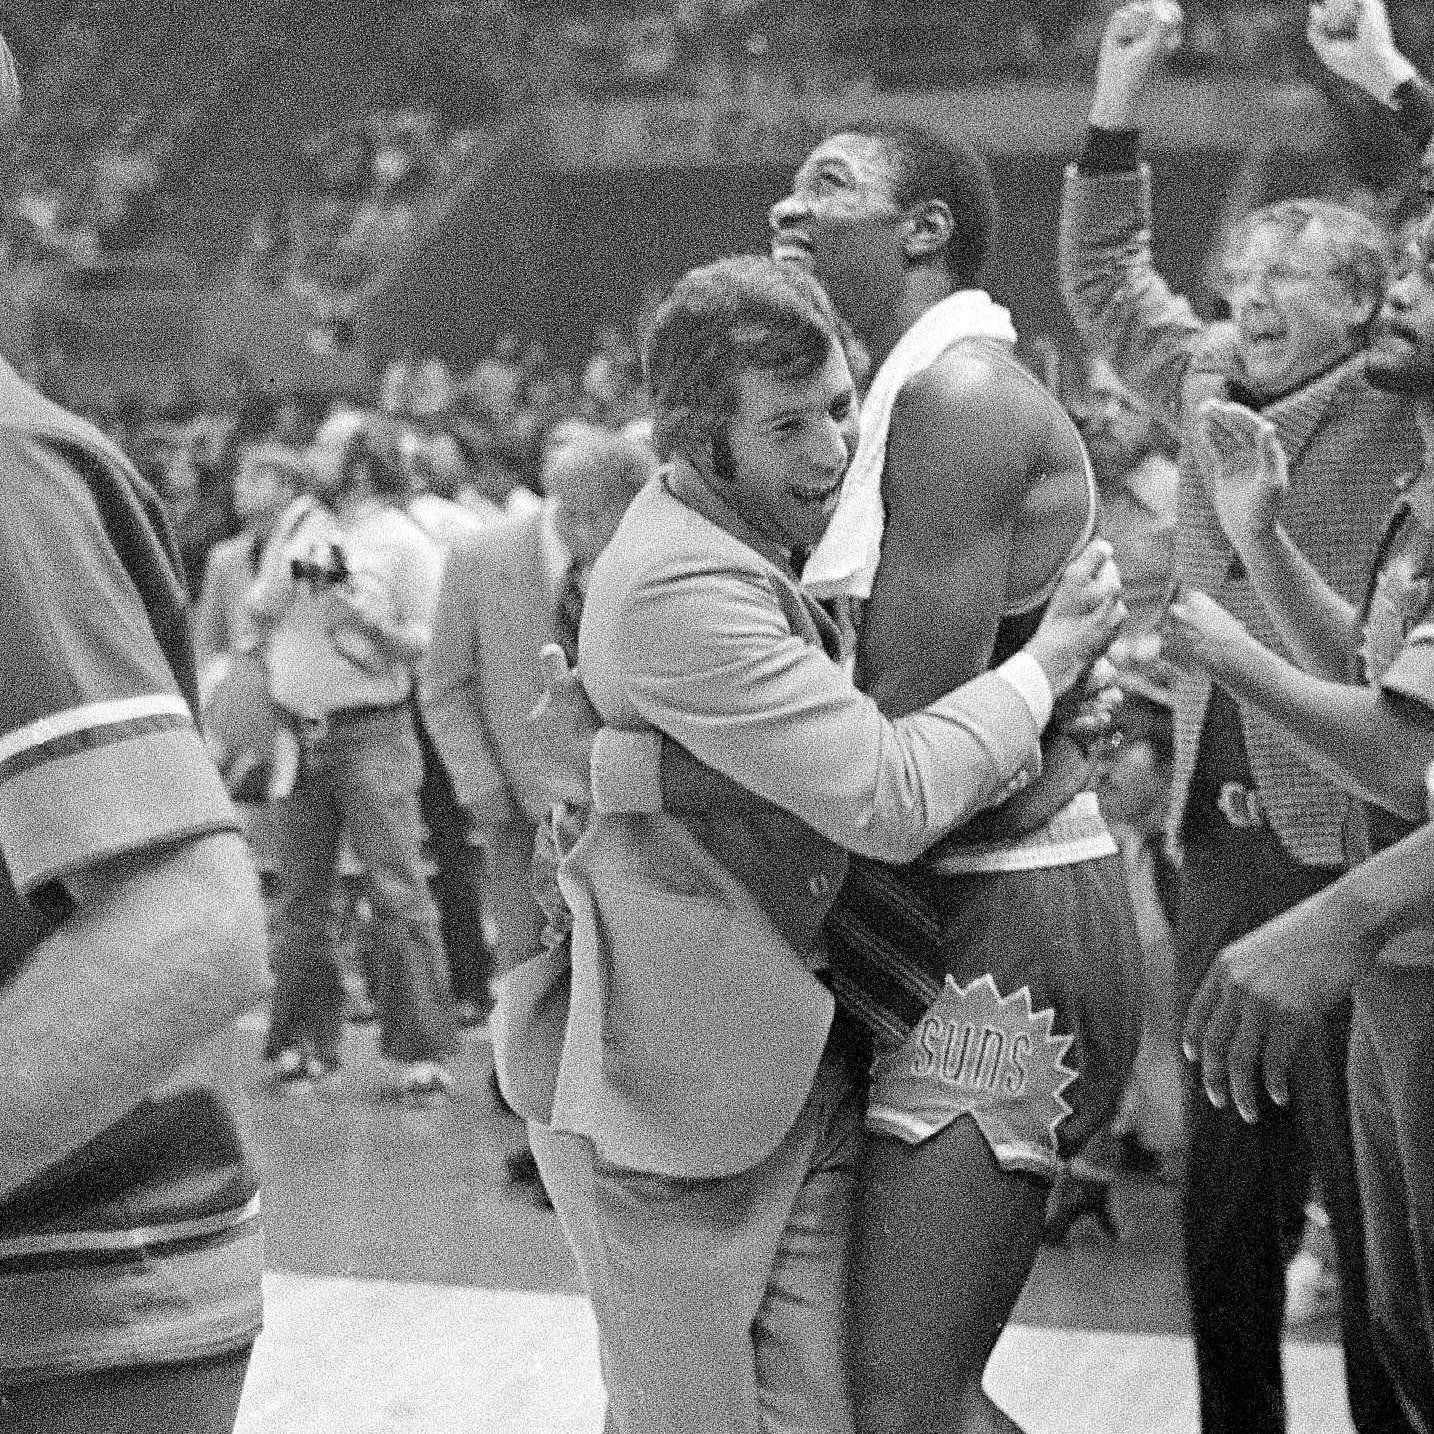 Remembering John MacLeod, legendary head coach of the Phoenix Suns